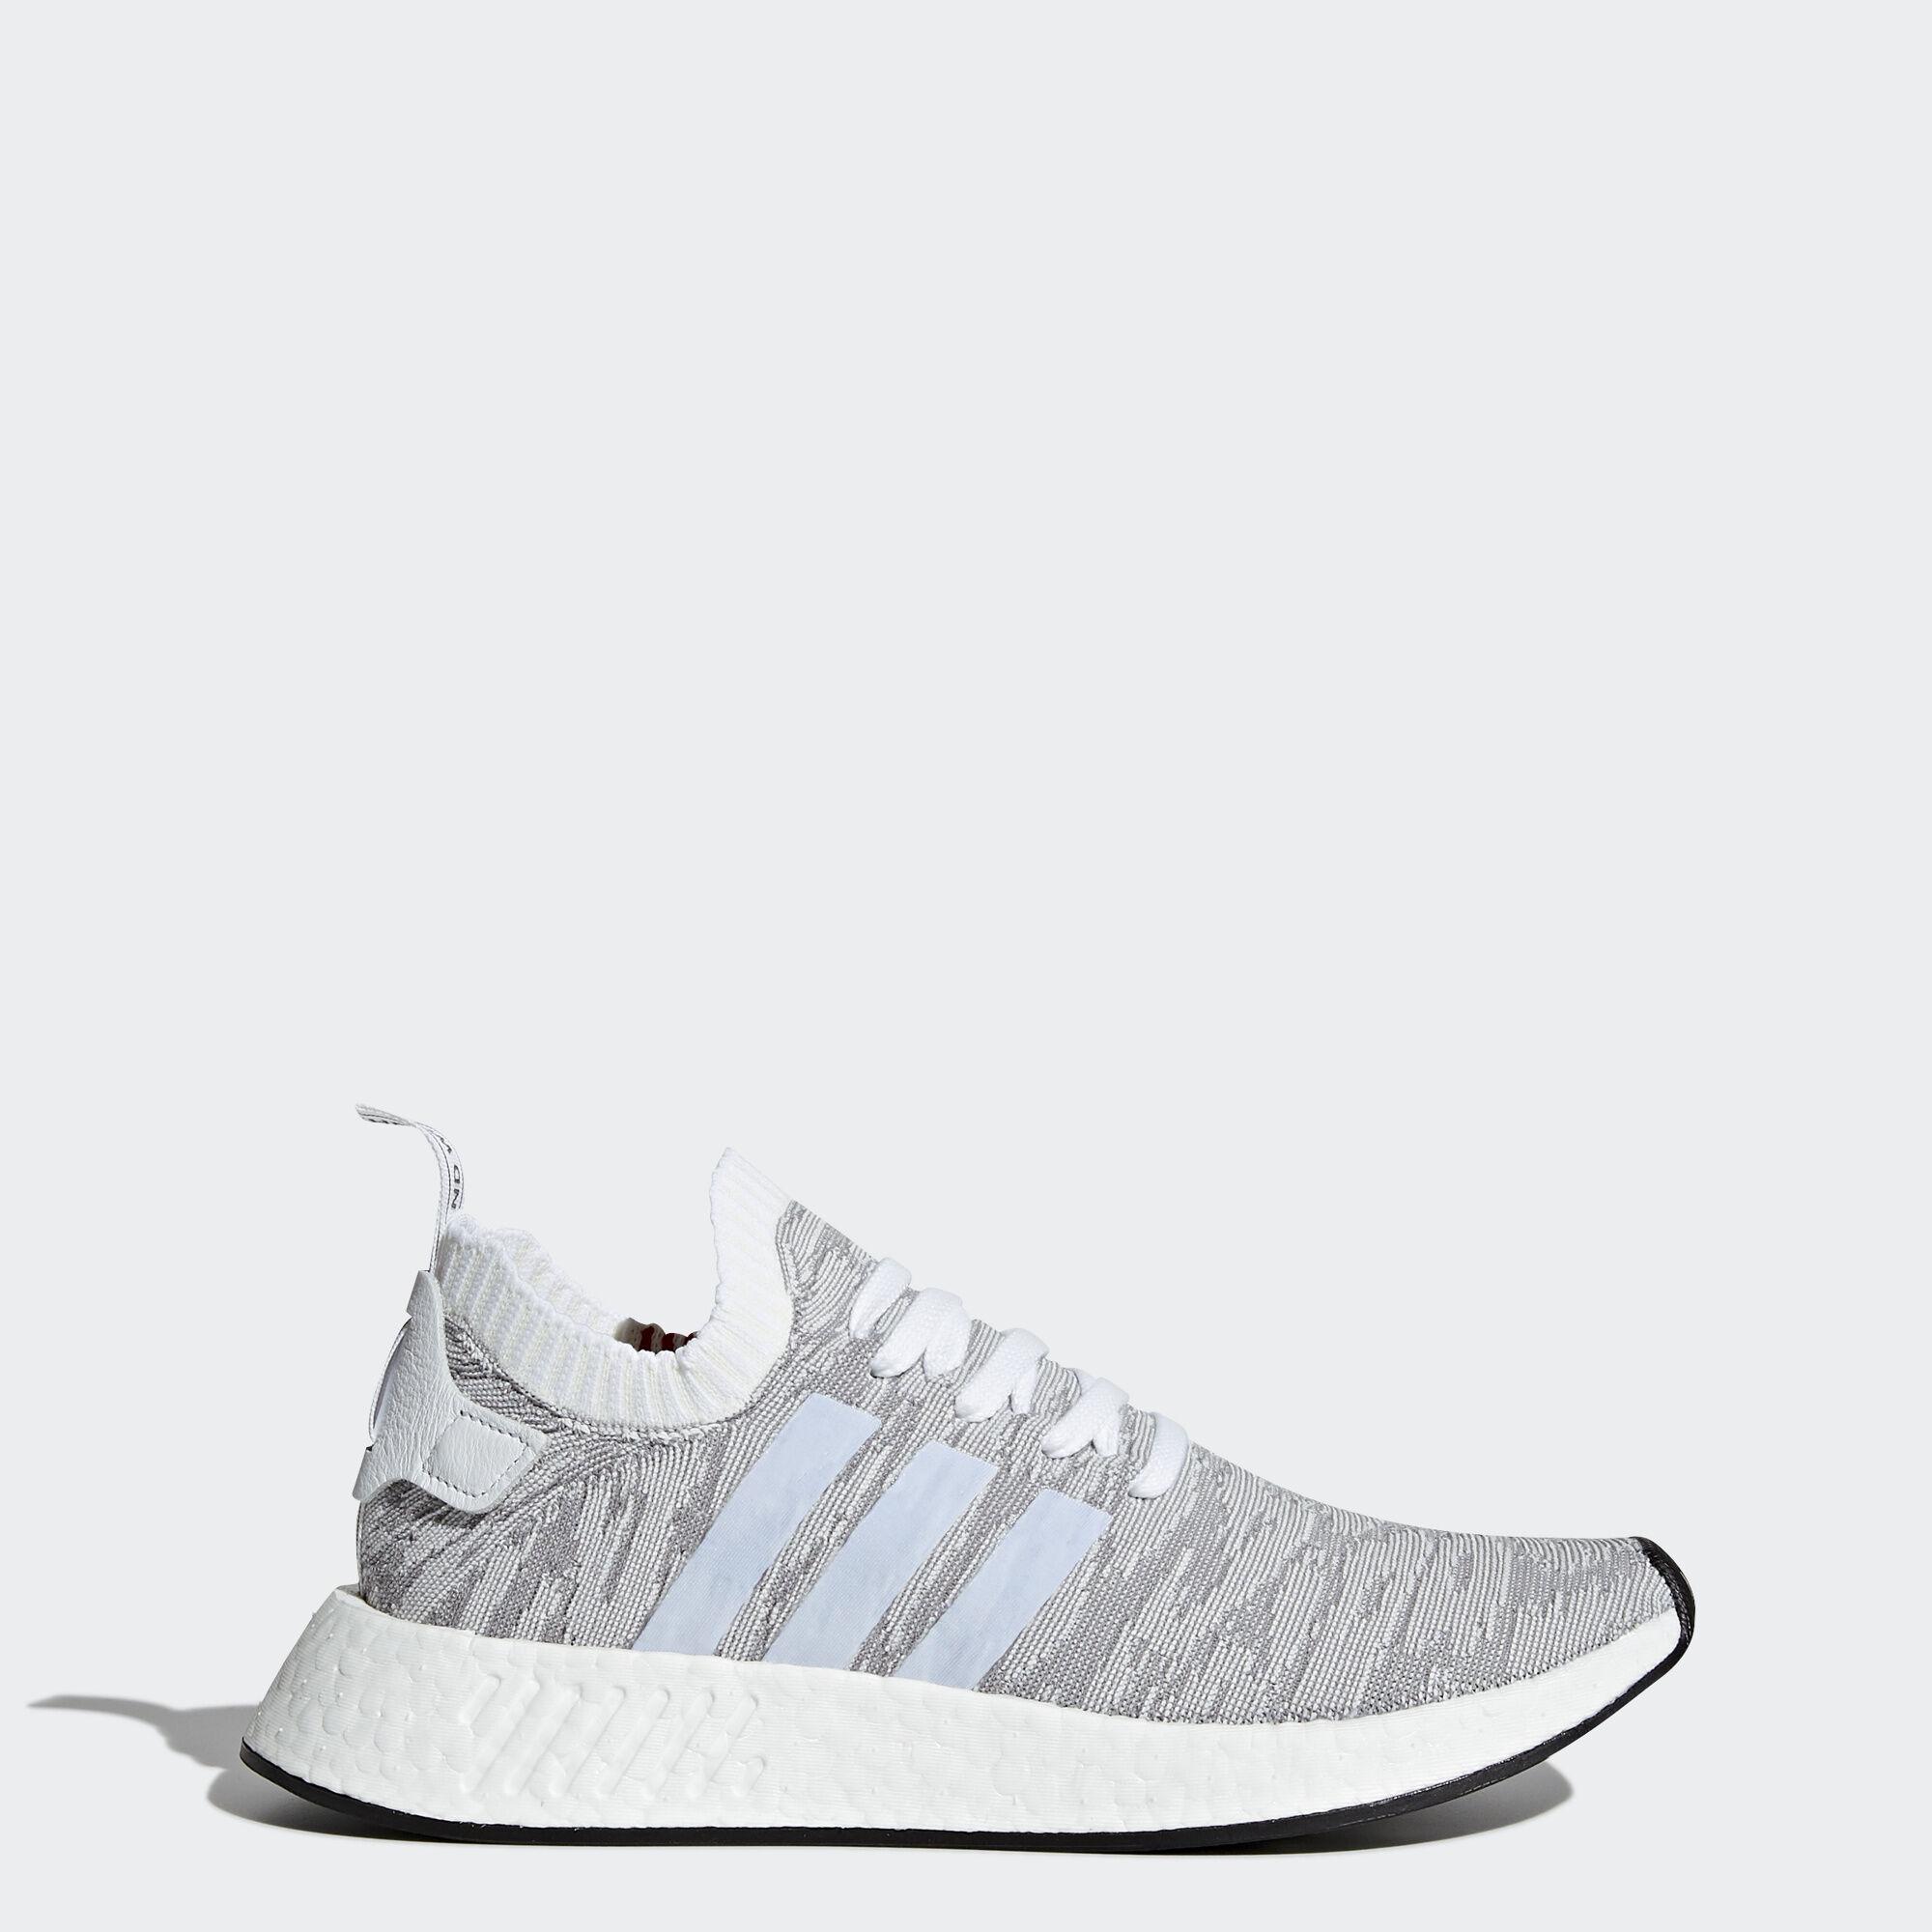 Adidas Zapatilla NMD_R2